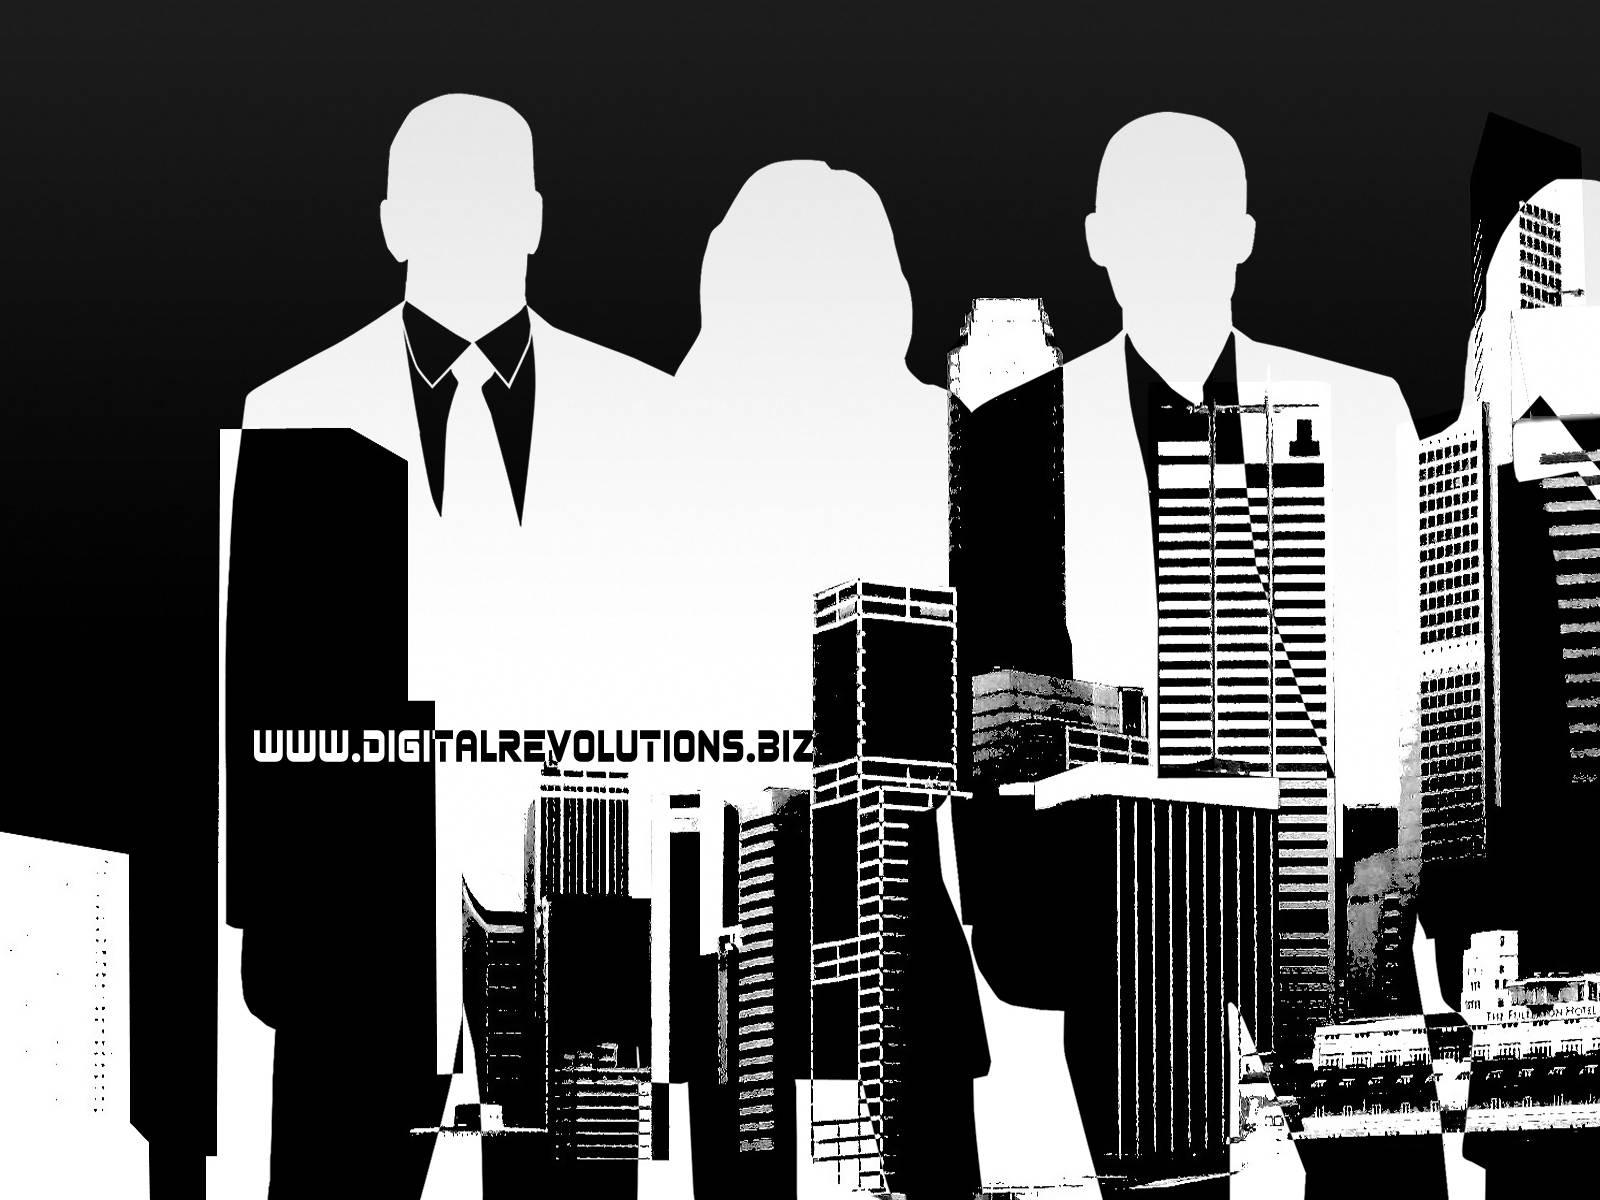 business wallpaper hd black: Corporate Desktop Wallpaper